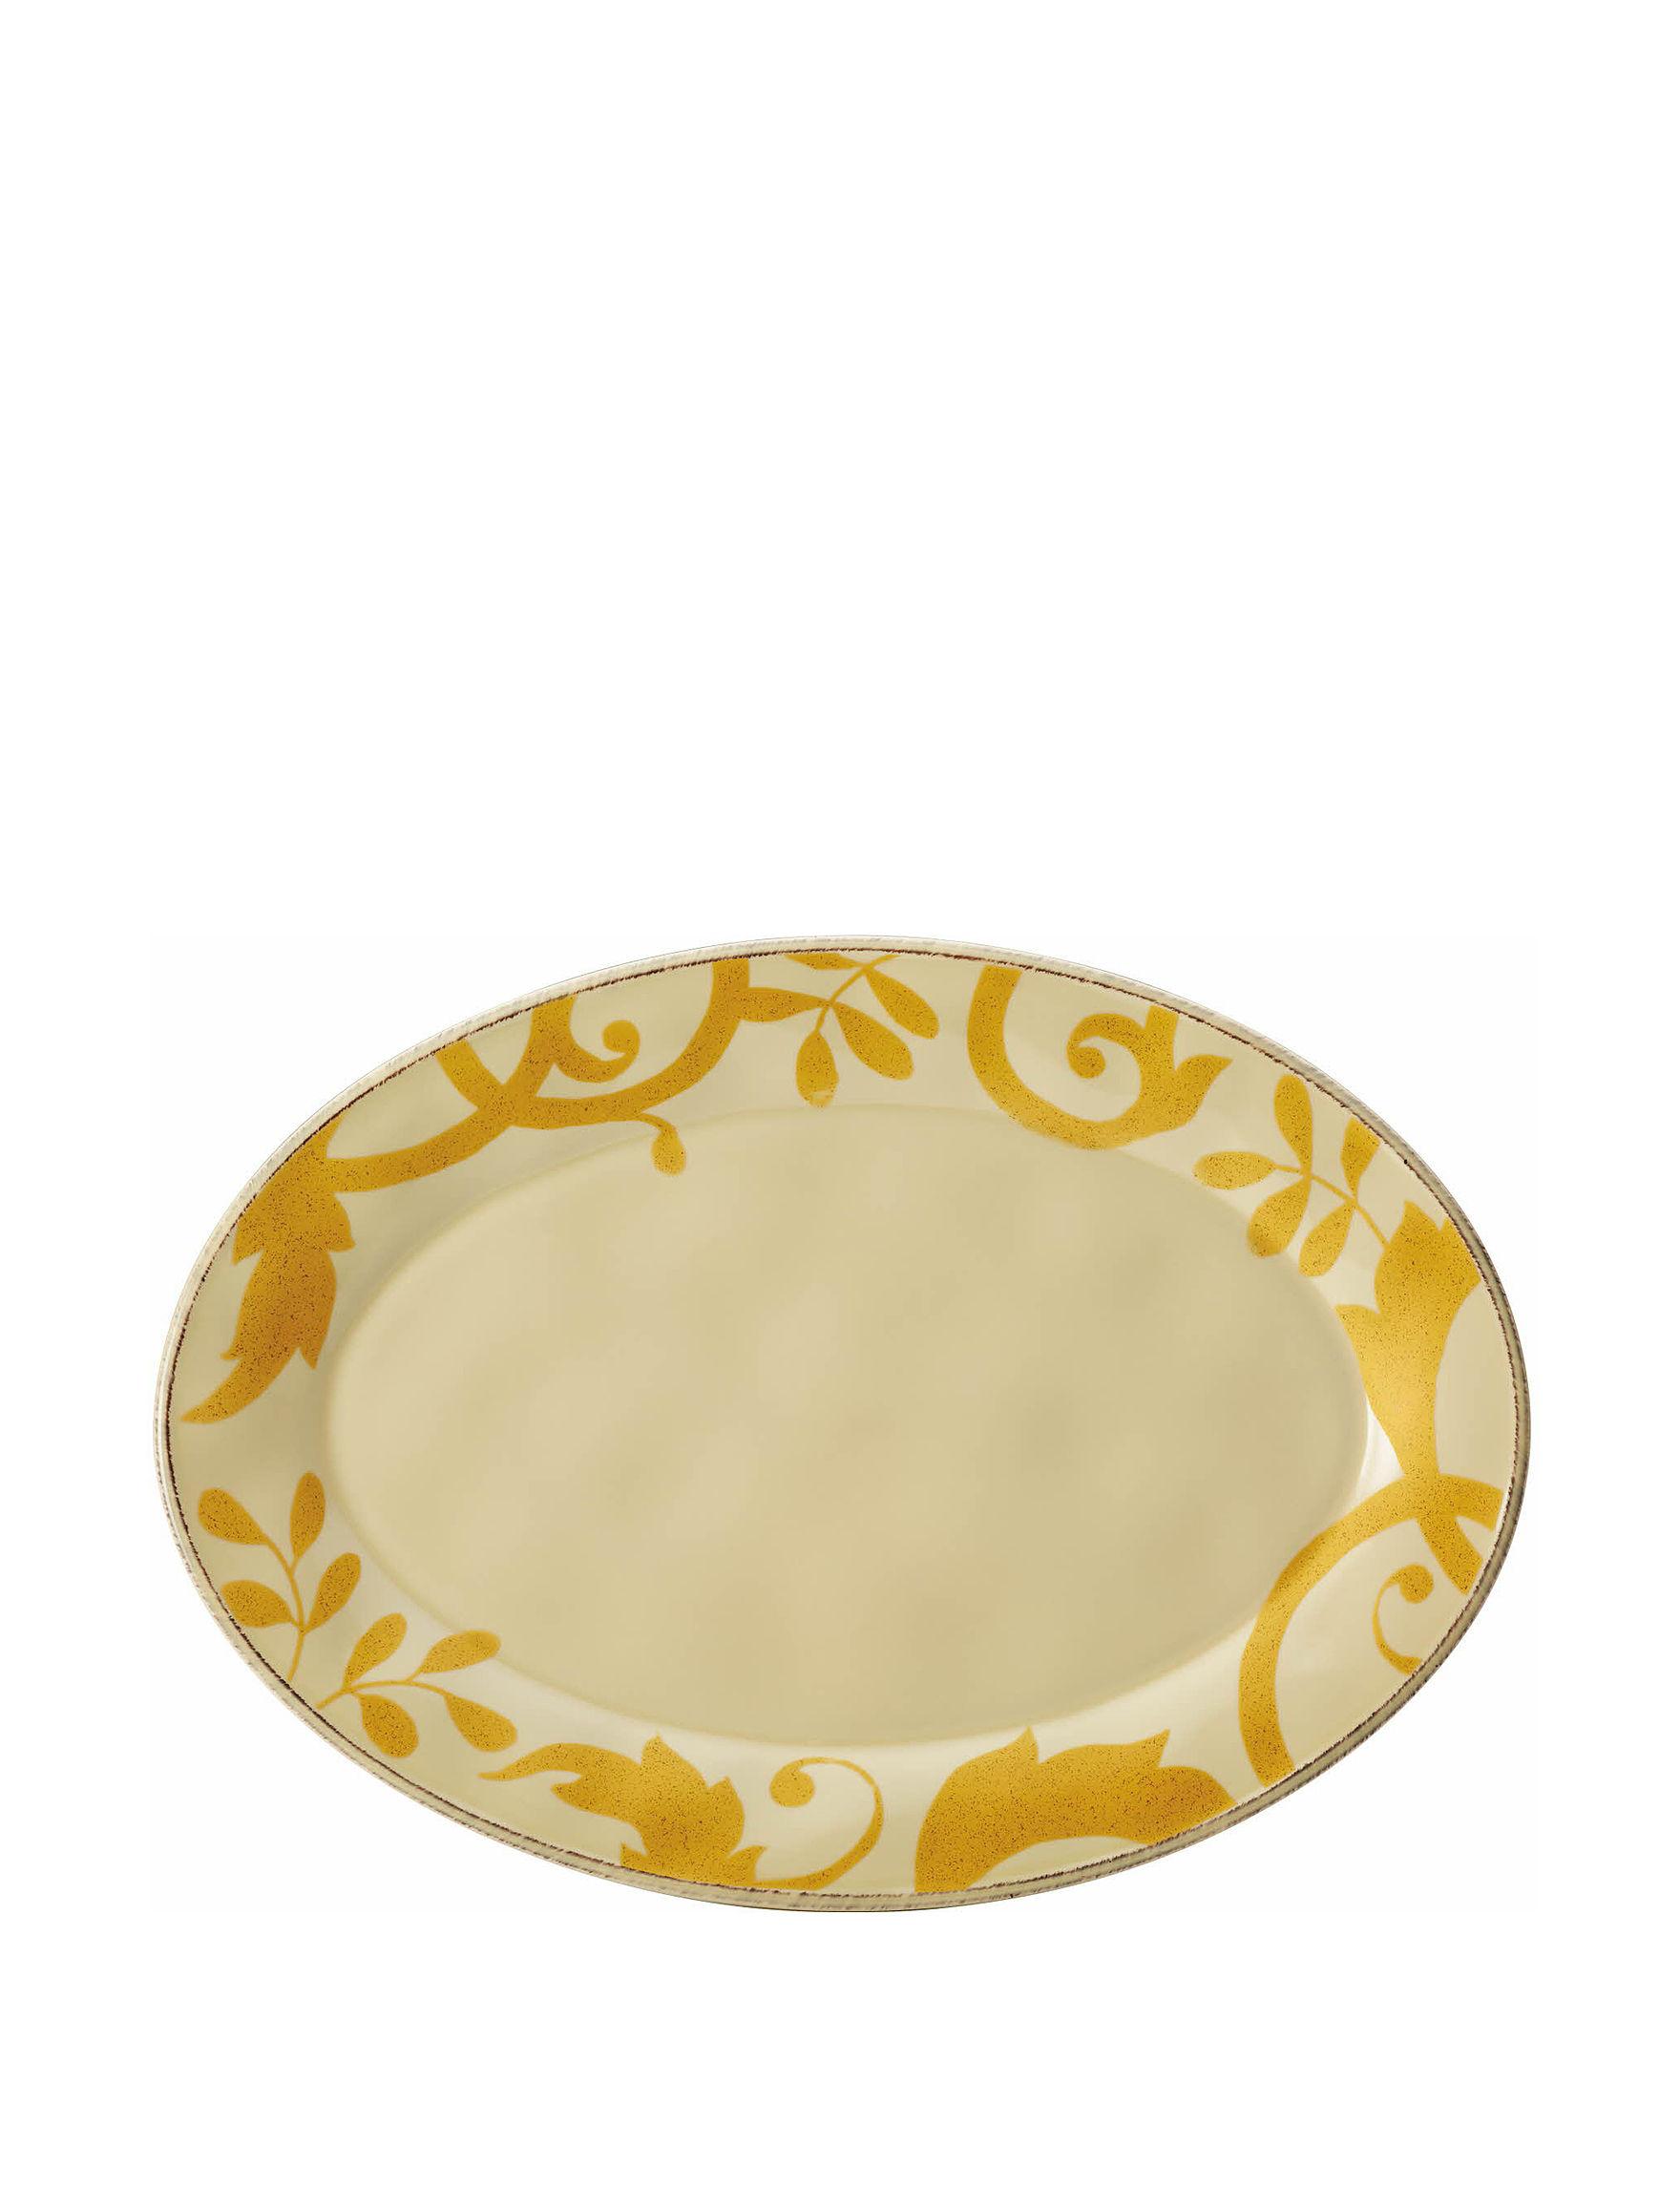 Rachael Ray Beige Serving Platters & Trays Serveware